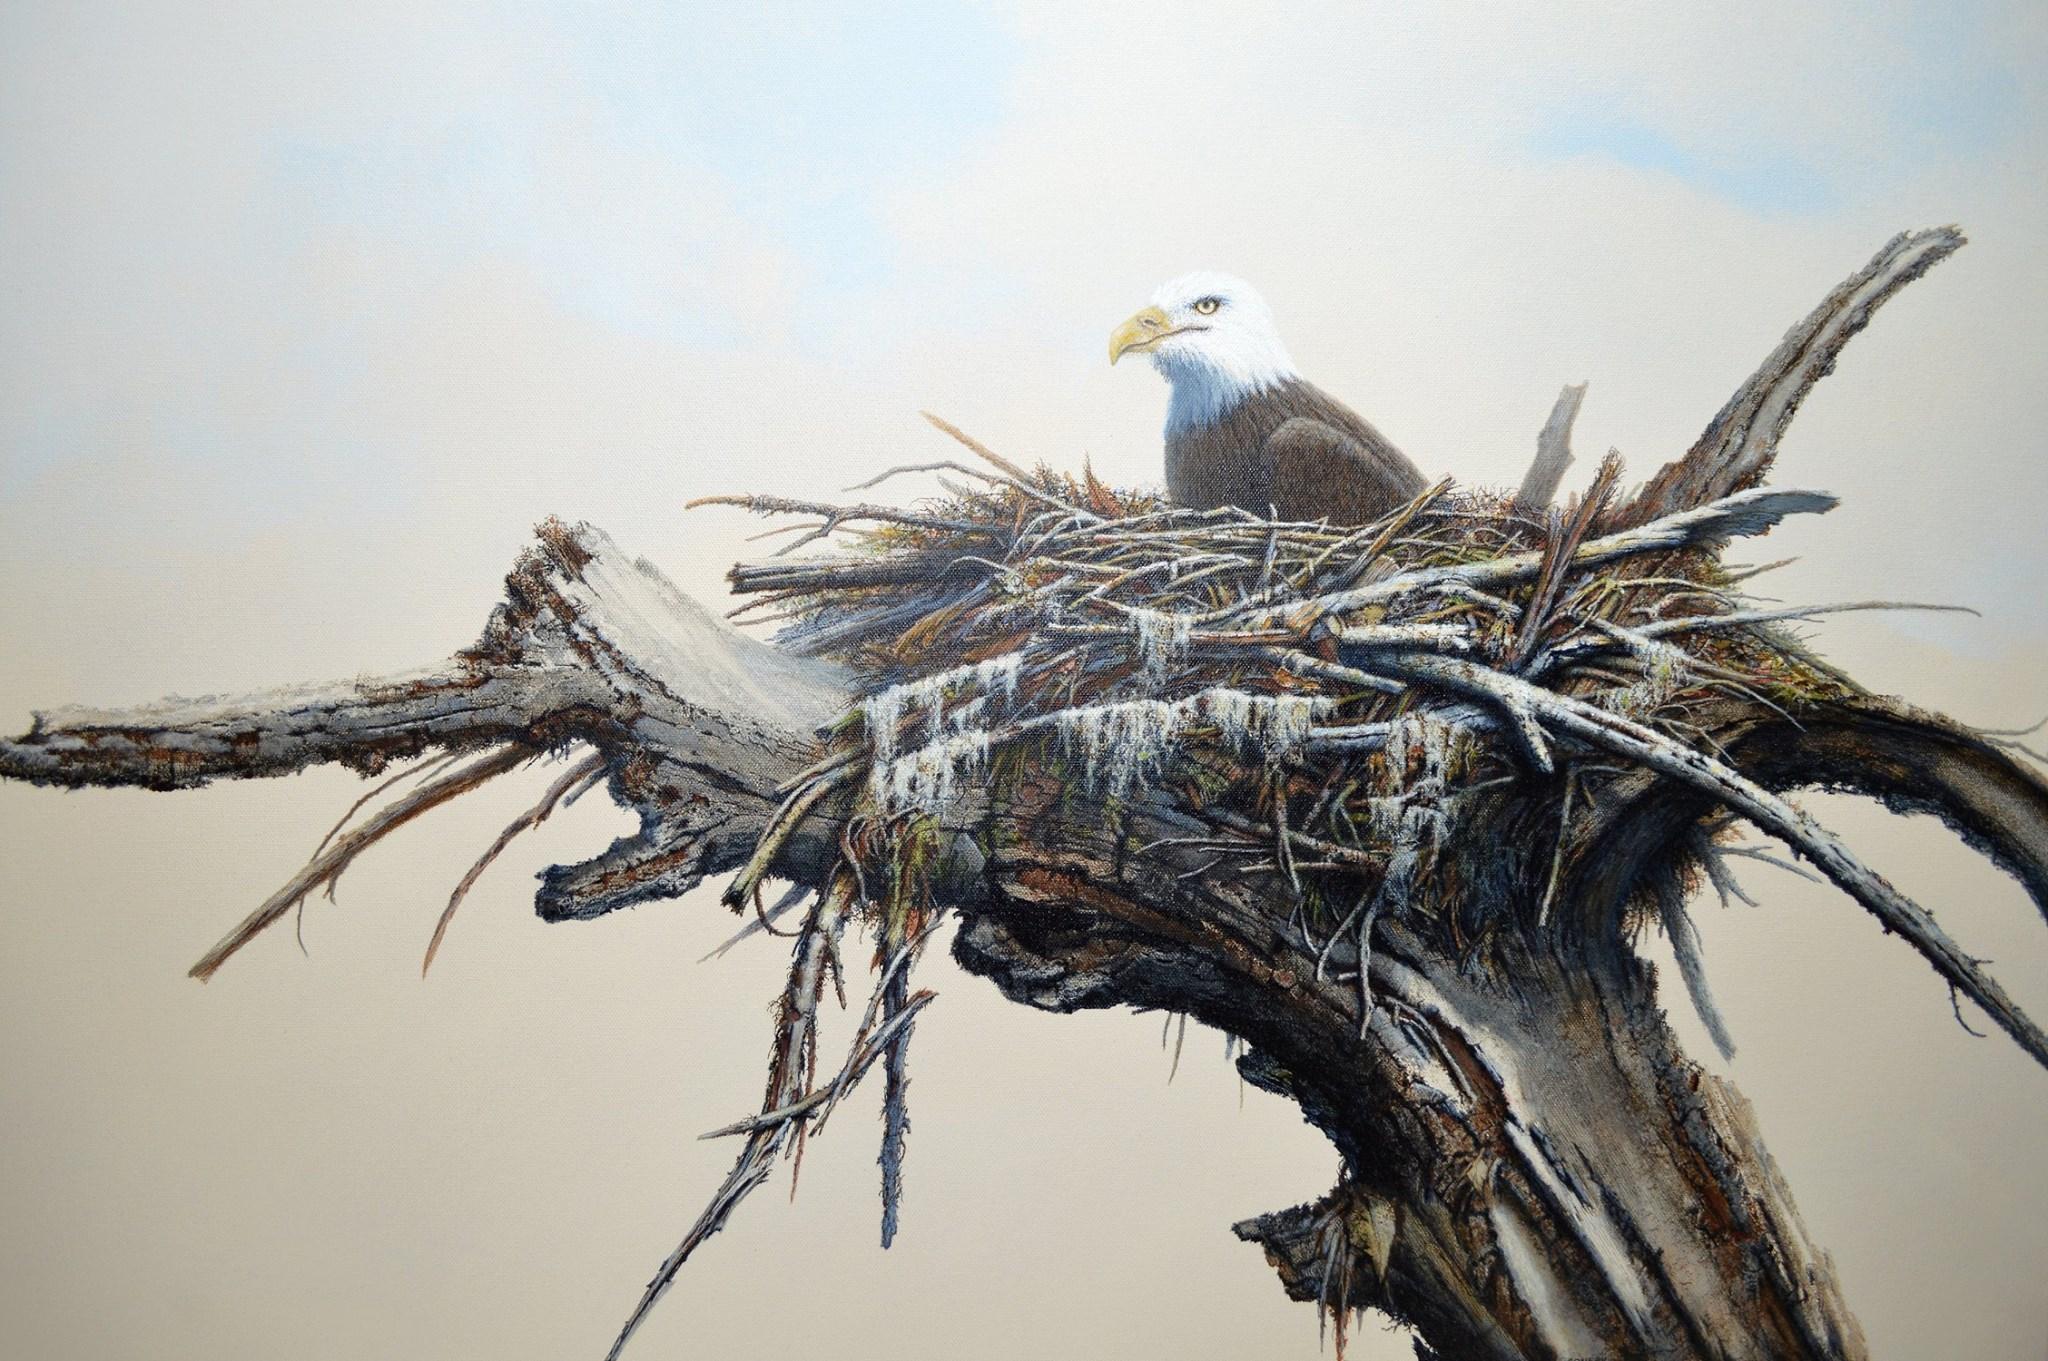 Nest Under Construction